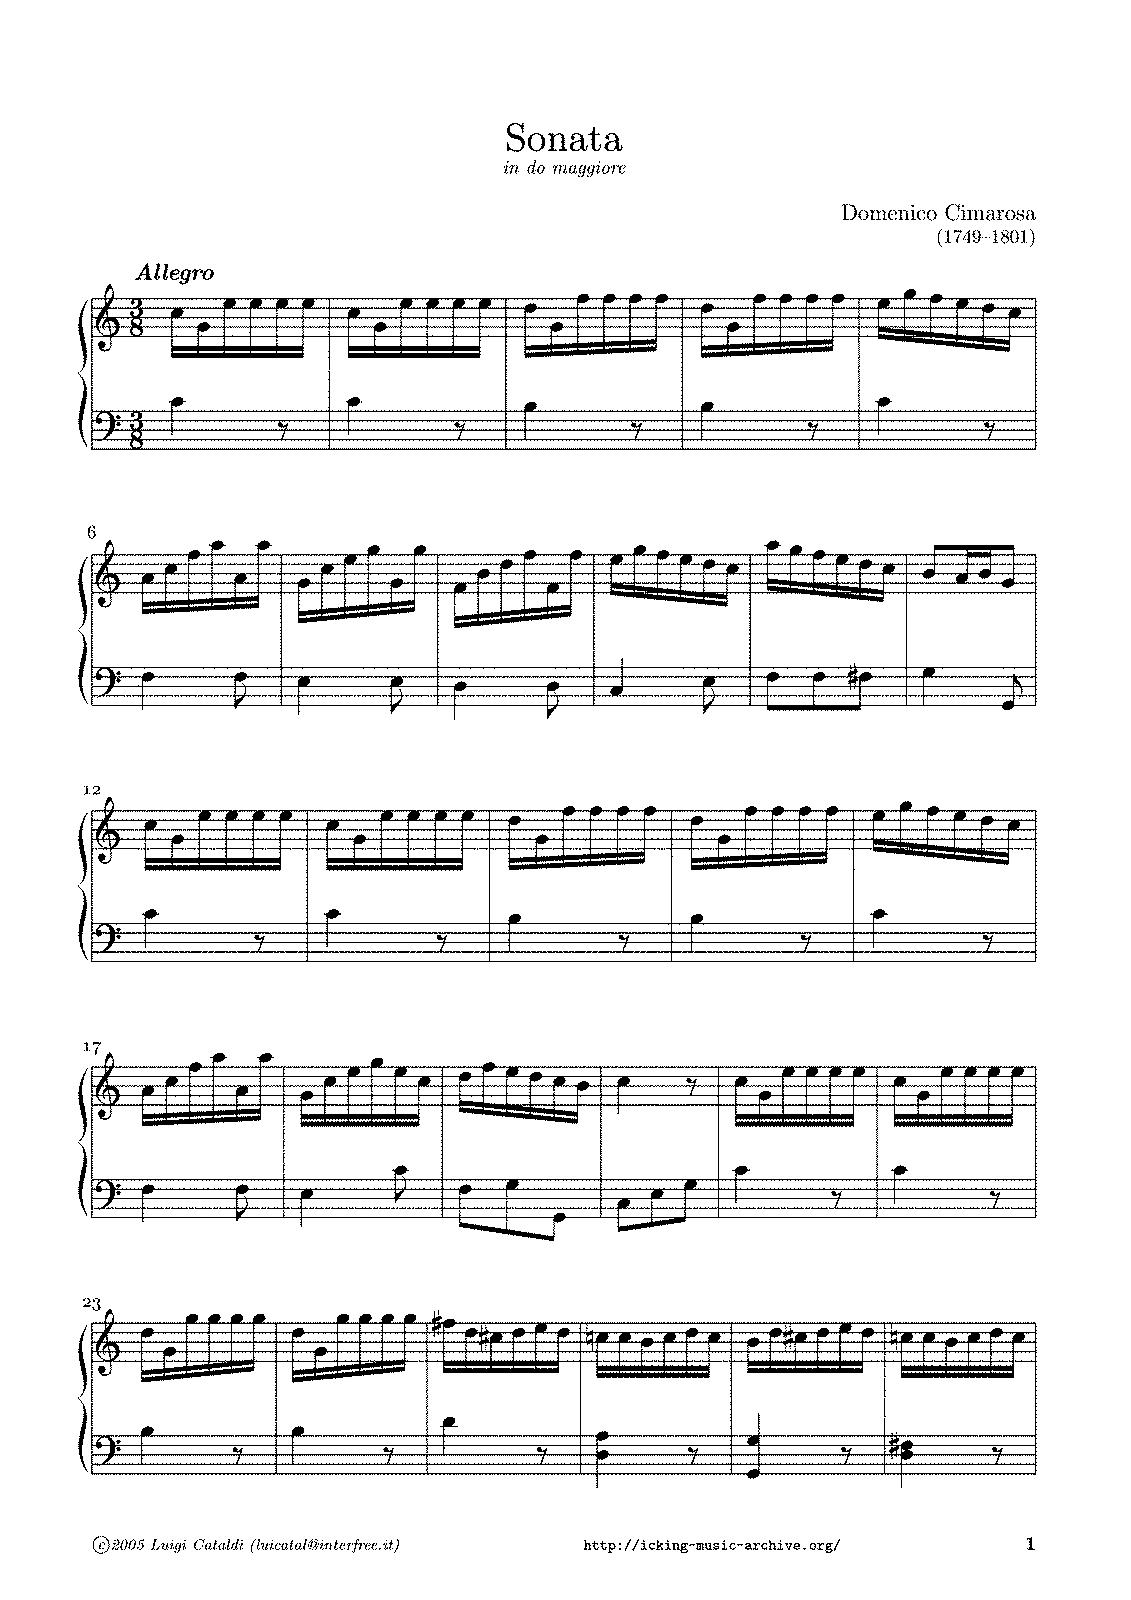 Keyboard Sonatas (Cimarosa, Domenico) - IMSLP/Petrucci Music